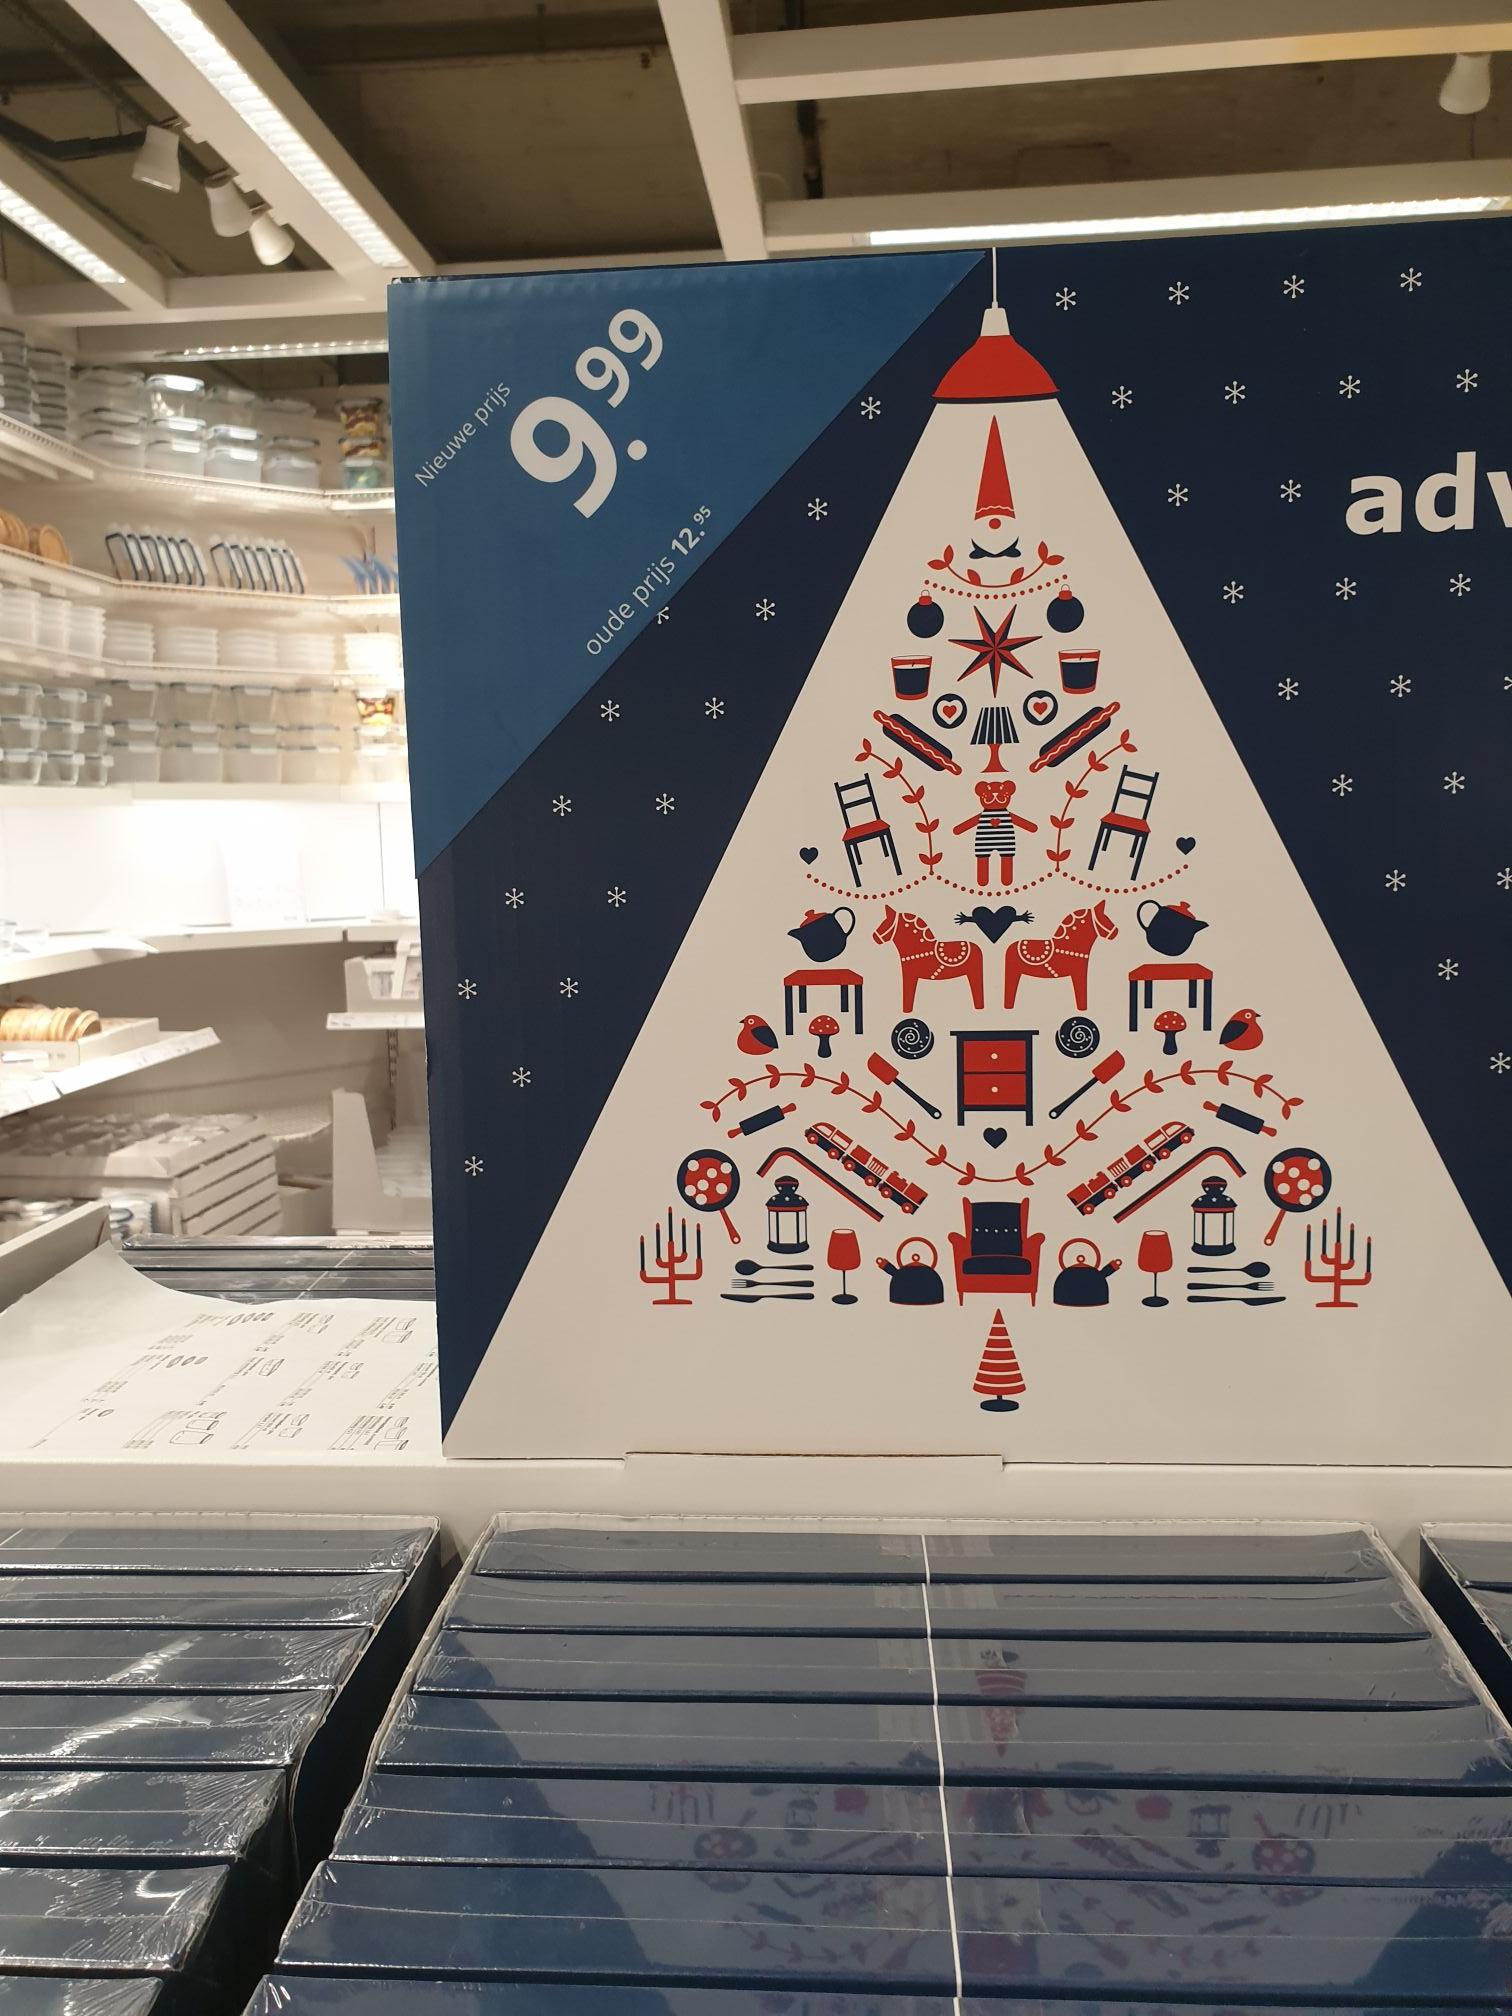 Ikea Amsterdam adventkalender